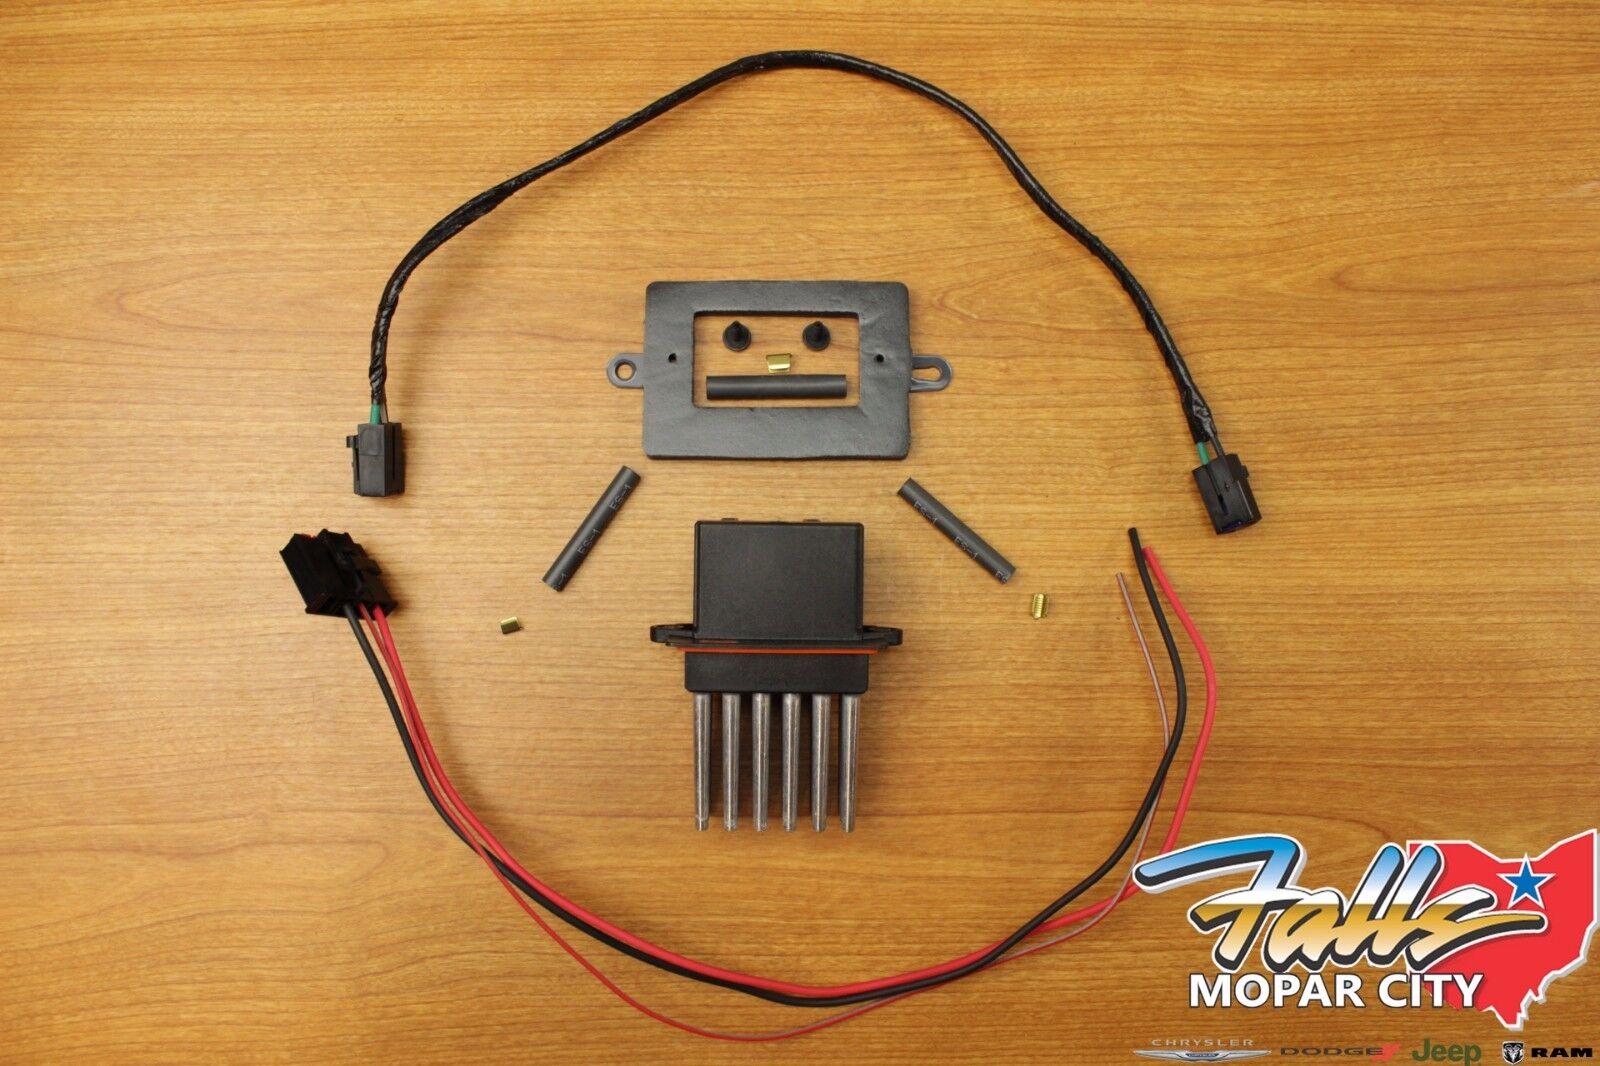 71 Mopar Wiring Harnesses For A Body Electrical Diagrams 5 Way Harness Blower Diy U2022